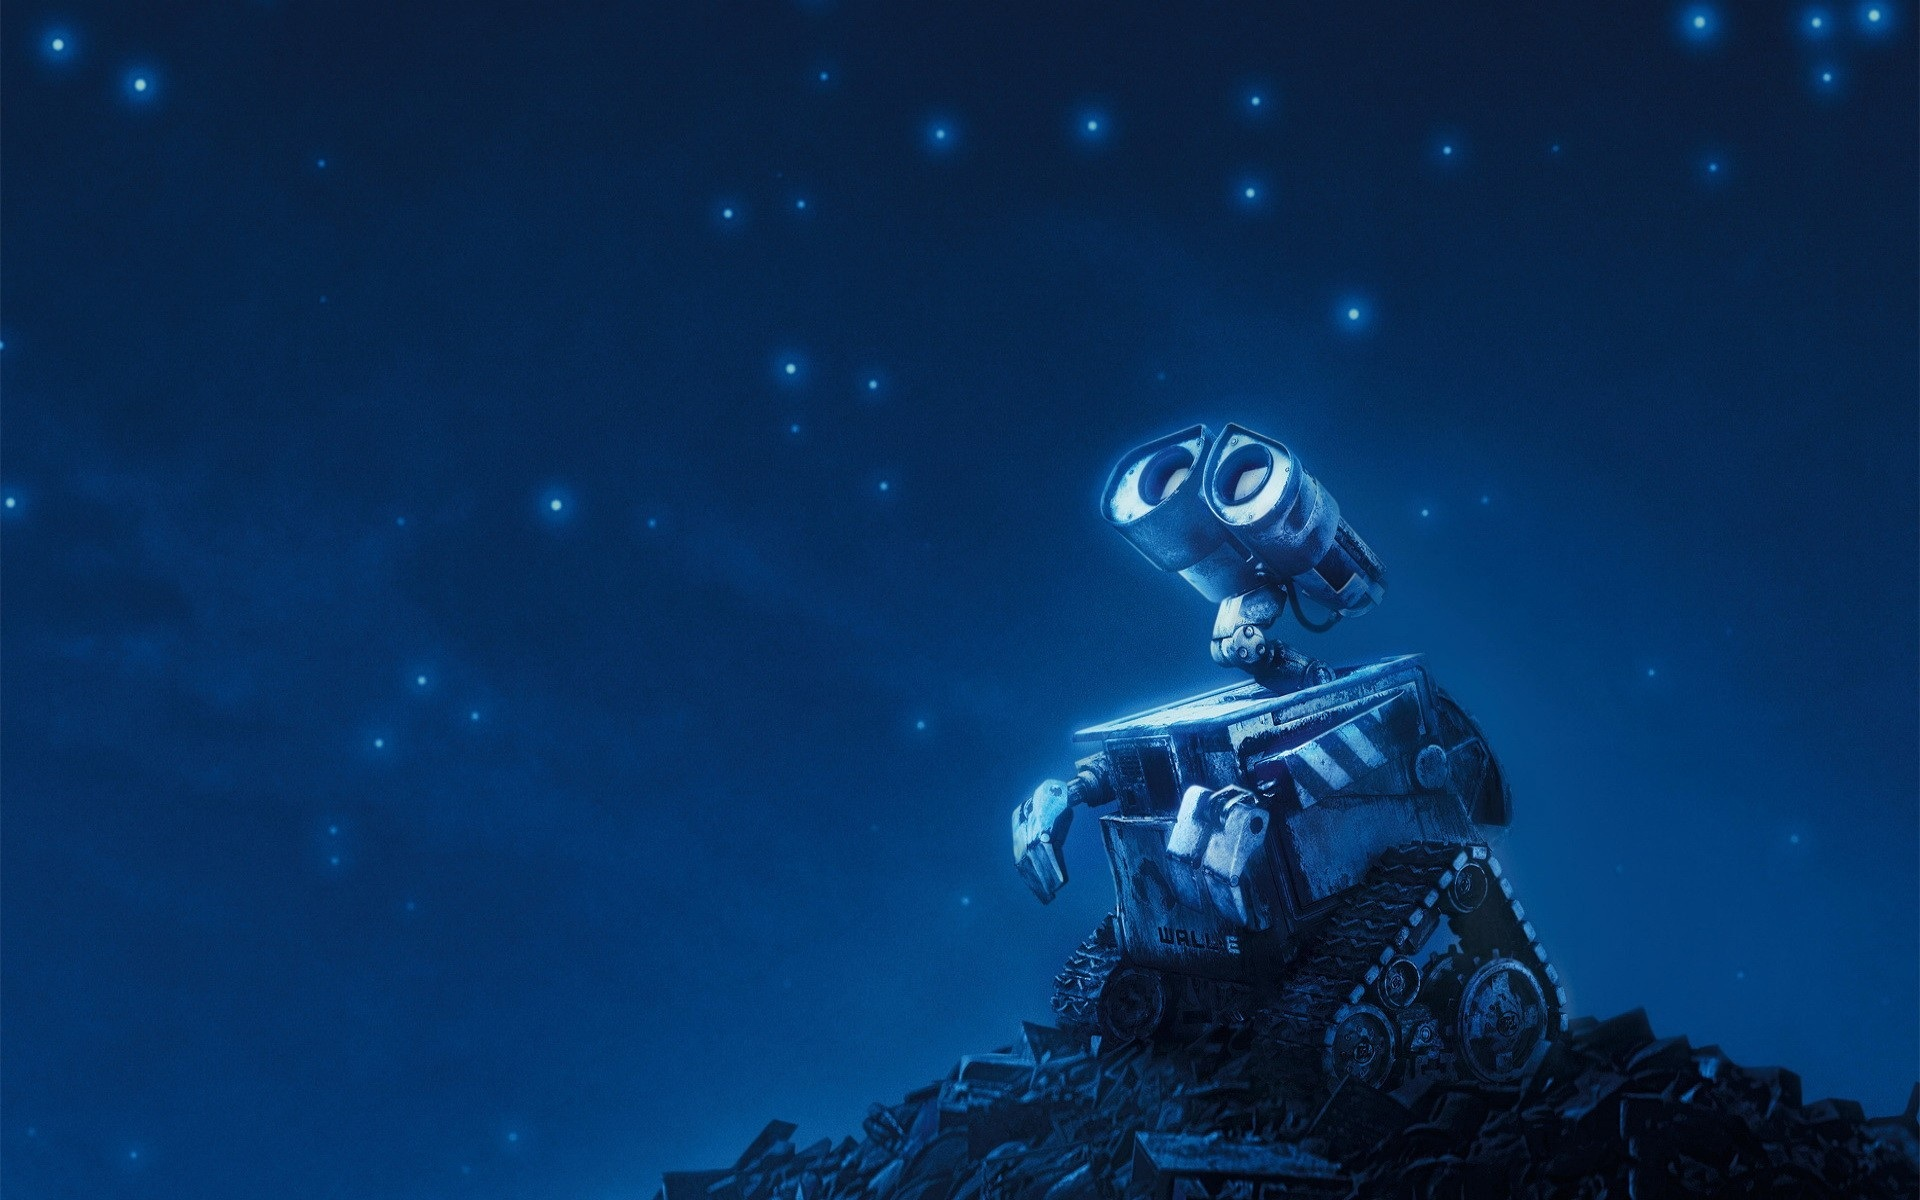 Night Sky Wallpaper Hd - Hd Wallpapers Of Night Sky , HD Wallpaper & Backgrounds